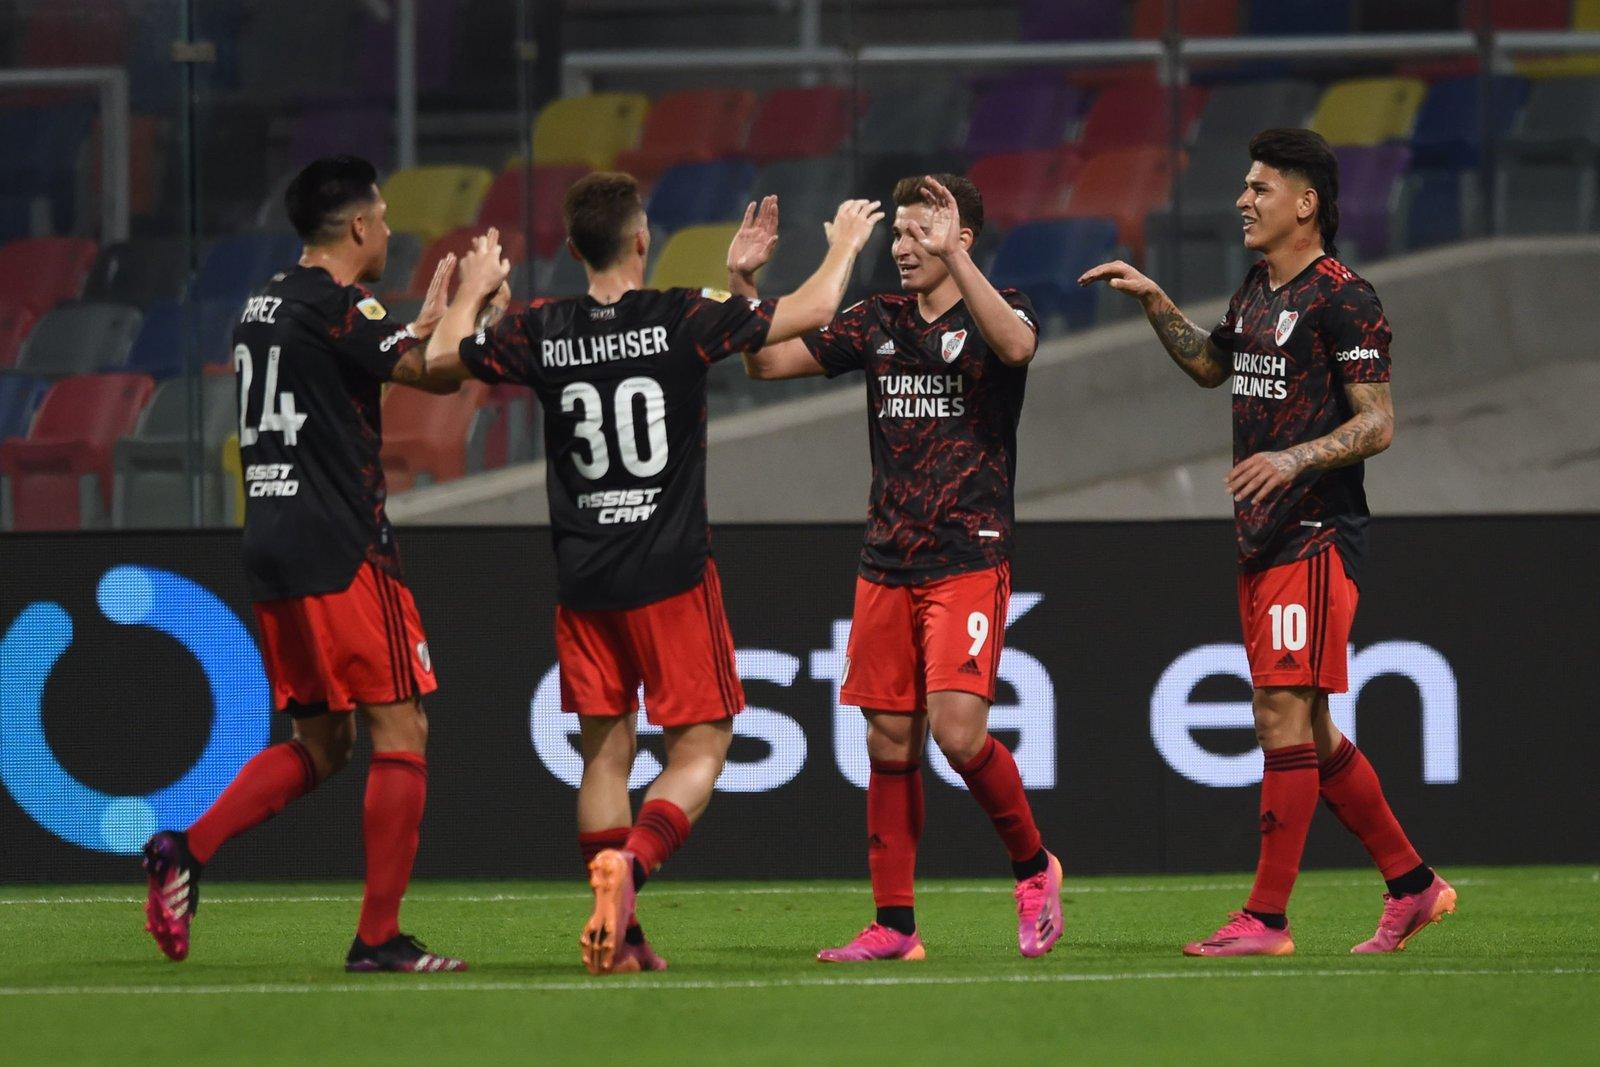 Wanderers suma tercer triunfo en fila y sube a la cima del Clausura uruguayo